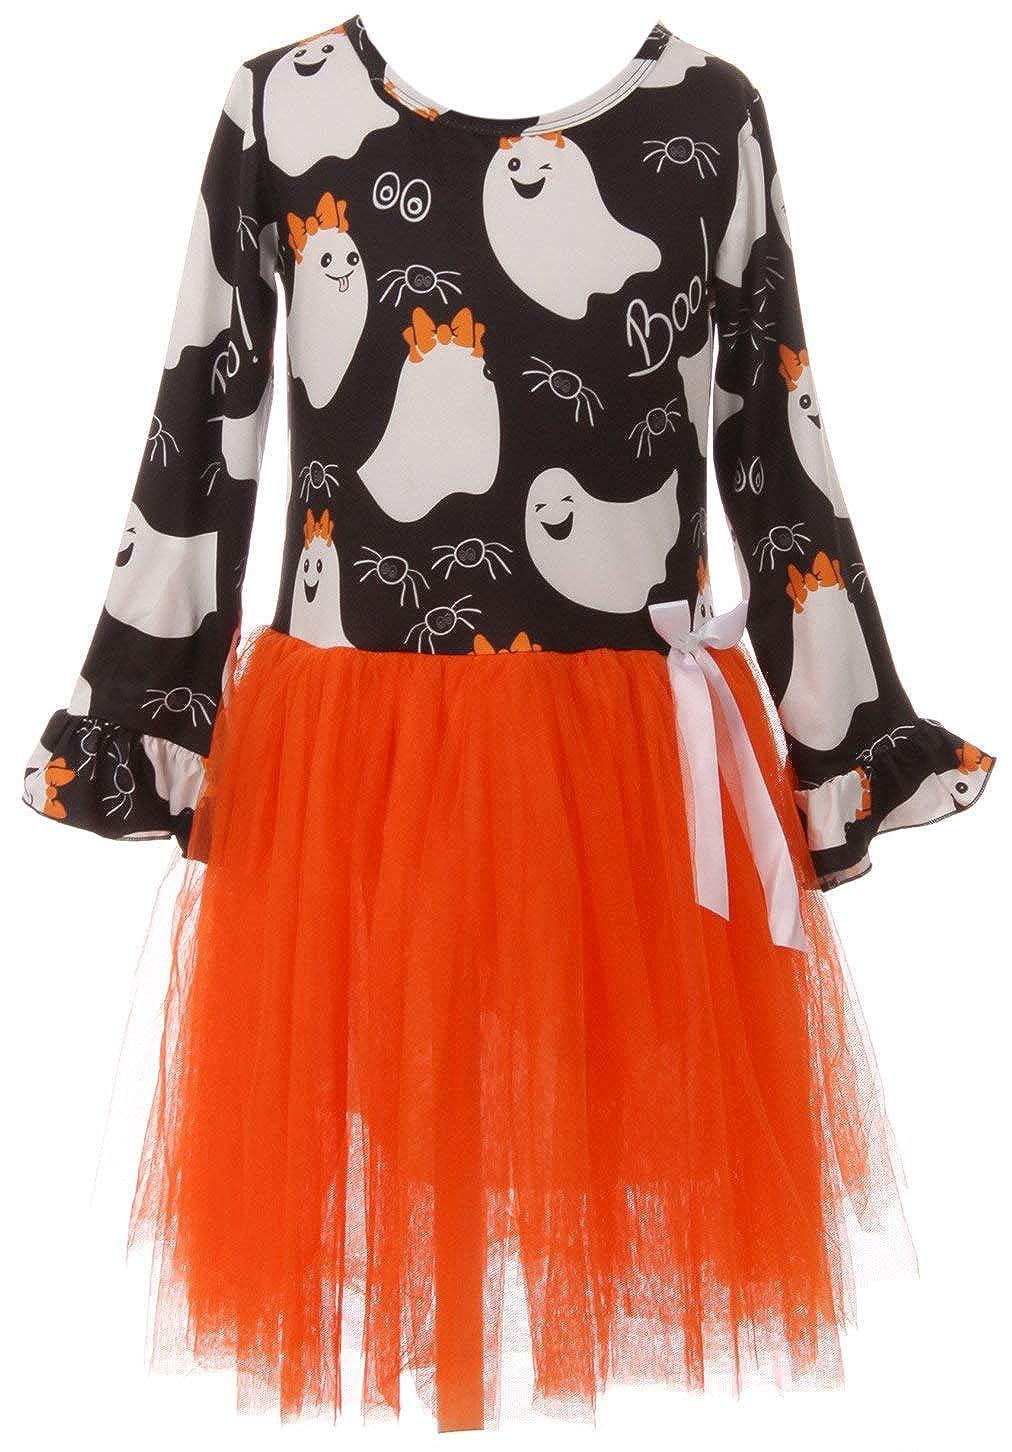 7f16ee987ee Red And Orange Flower Girl Dresses